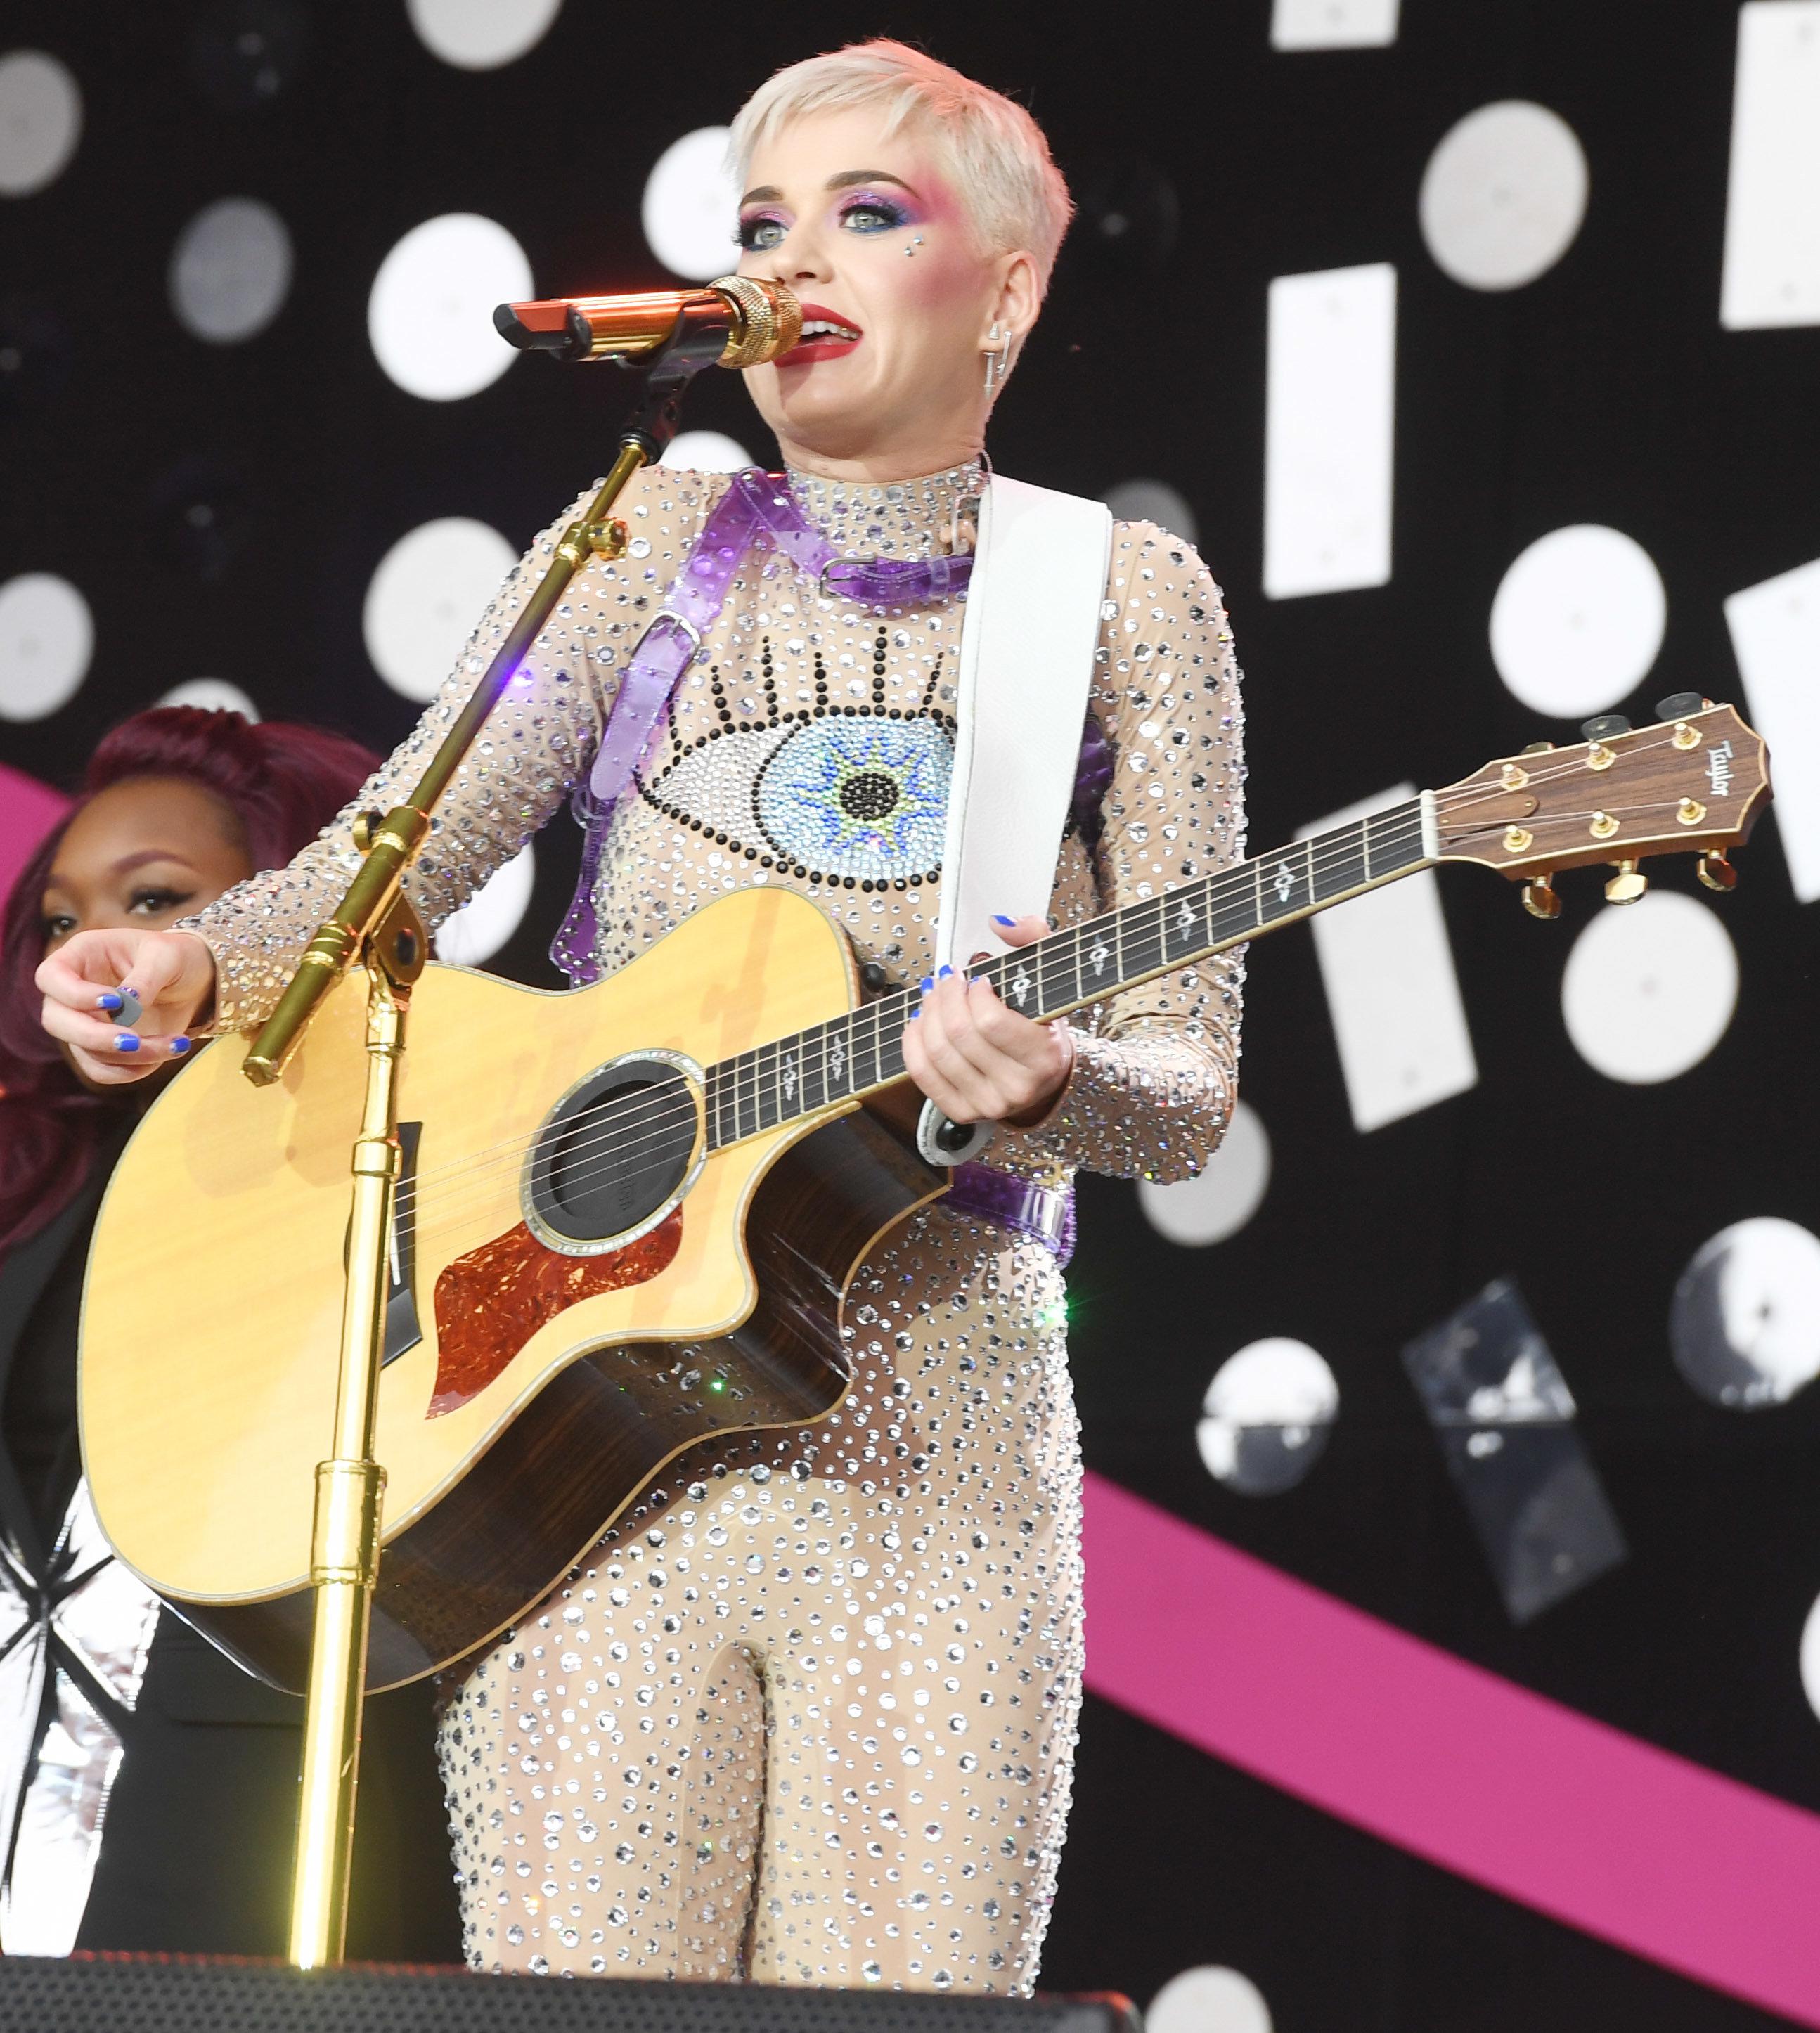 Katy Perry Just Upset Some Koala Advocates In Australia